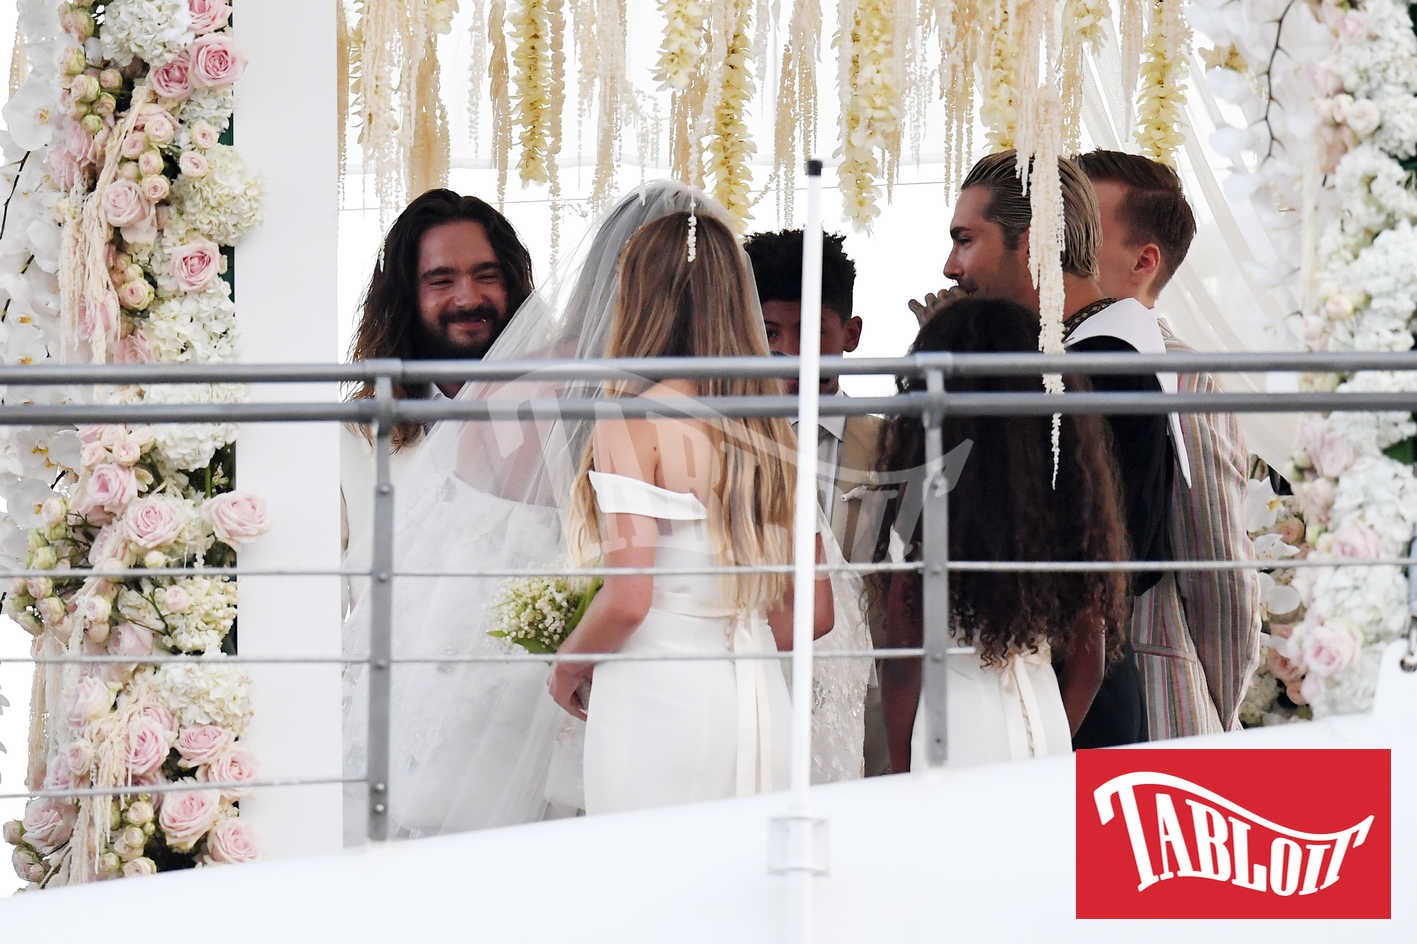 Heidi Klum e Tom Kaulitz durante la cerimonia sullo yacht Christina O